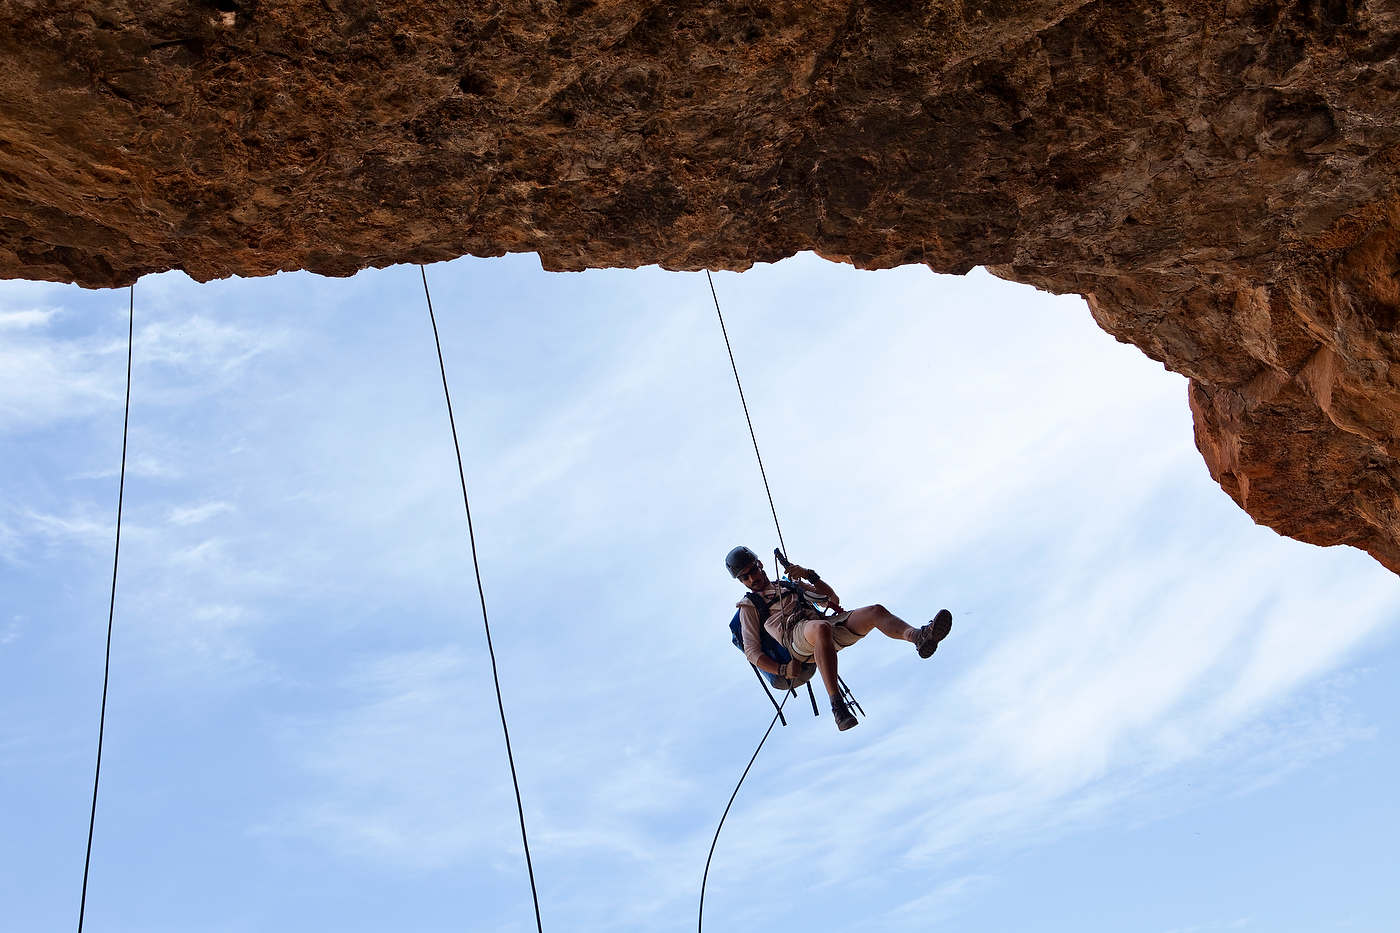 Team Gypsies John Post rappels into a cave.